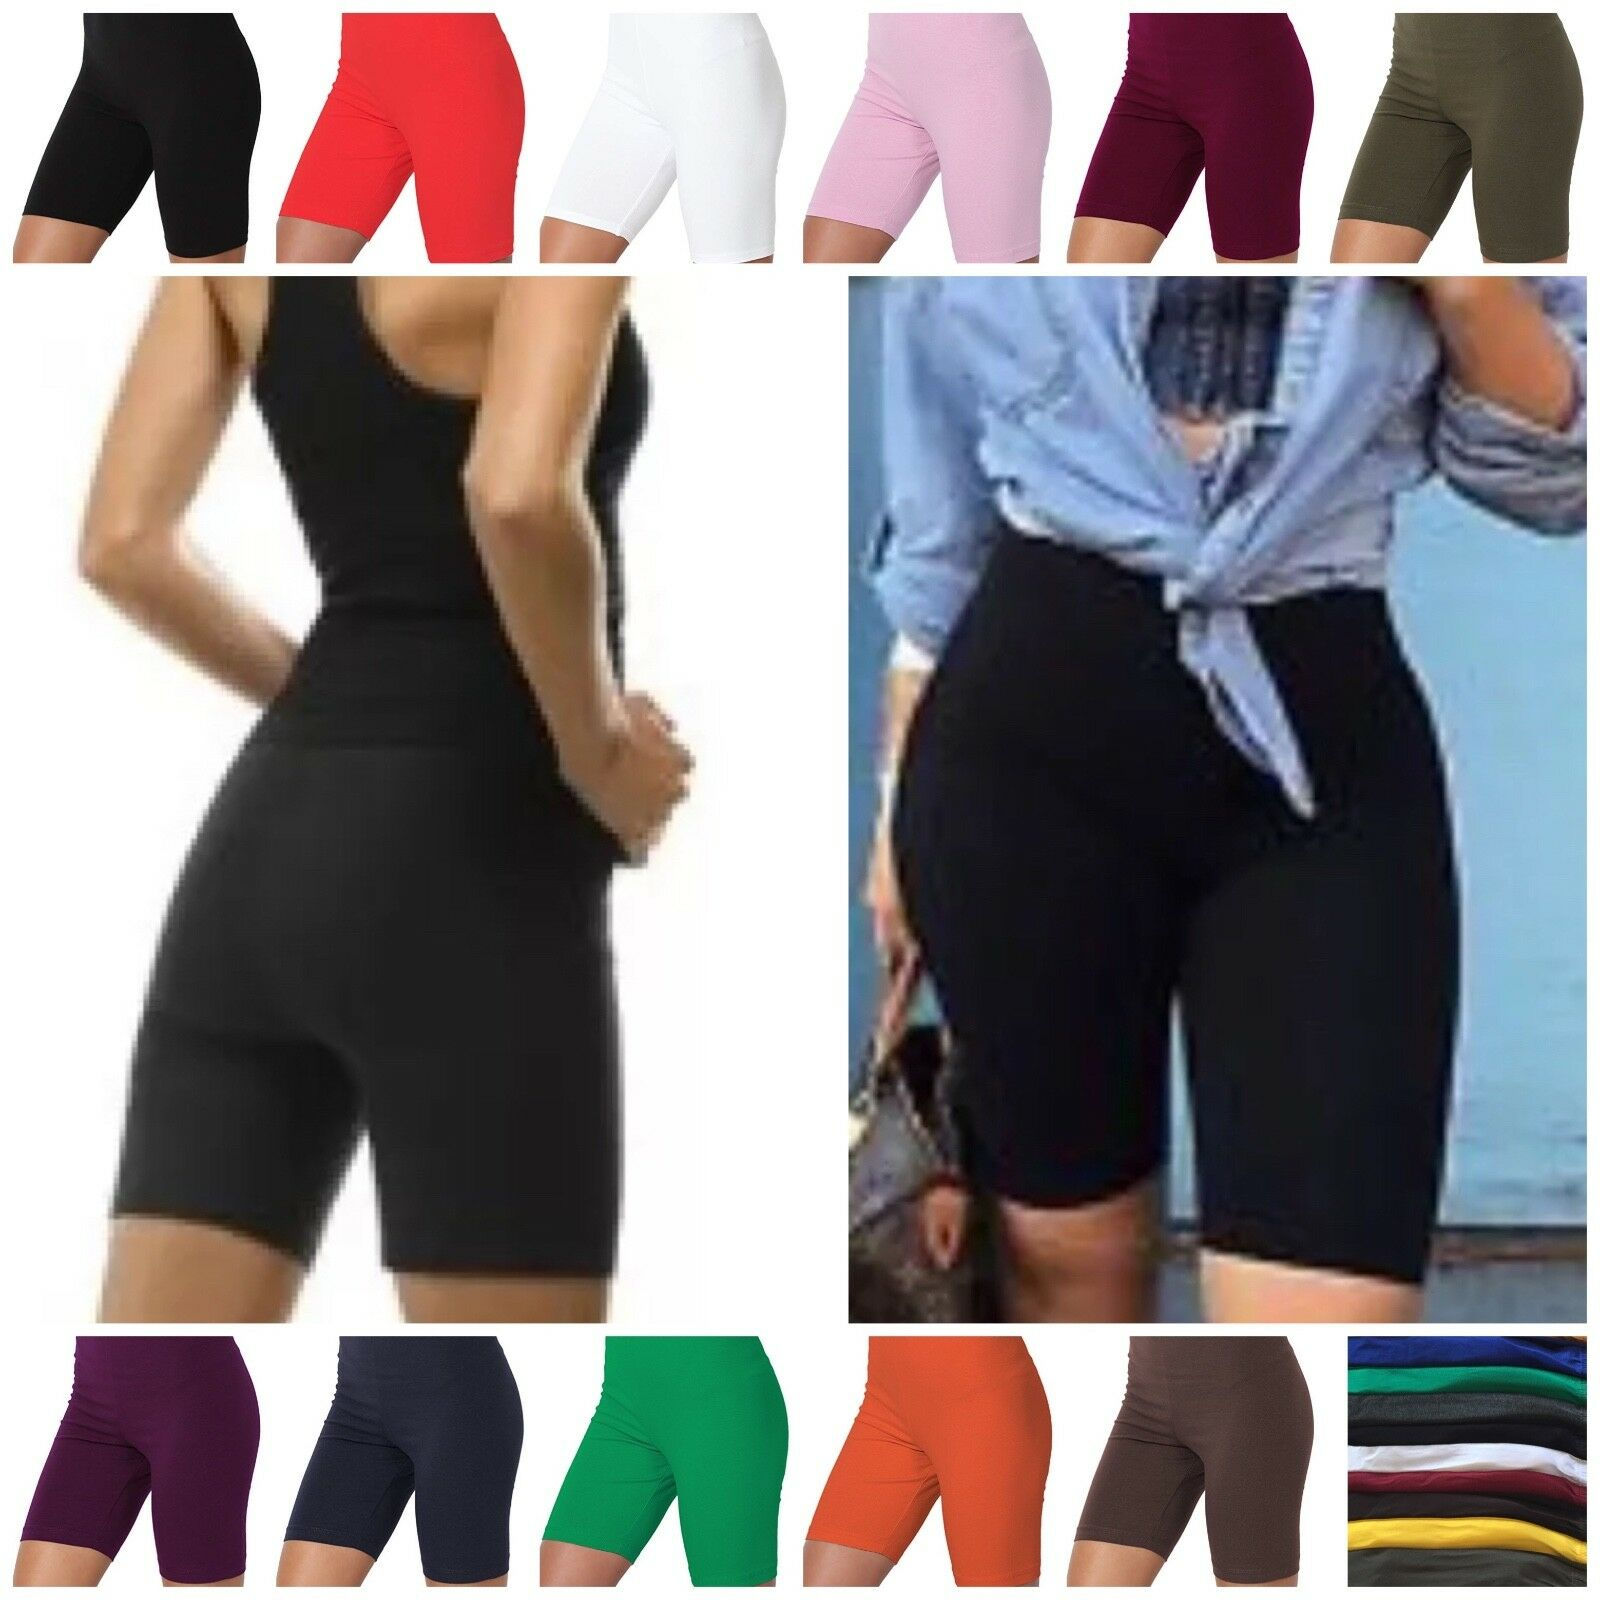 Cotton Spandex Biker Shorts LOT 1 OR 6 Bermuda Women's Plus Size HI-WAIST S-3XL